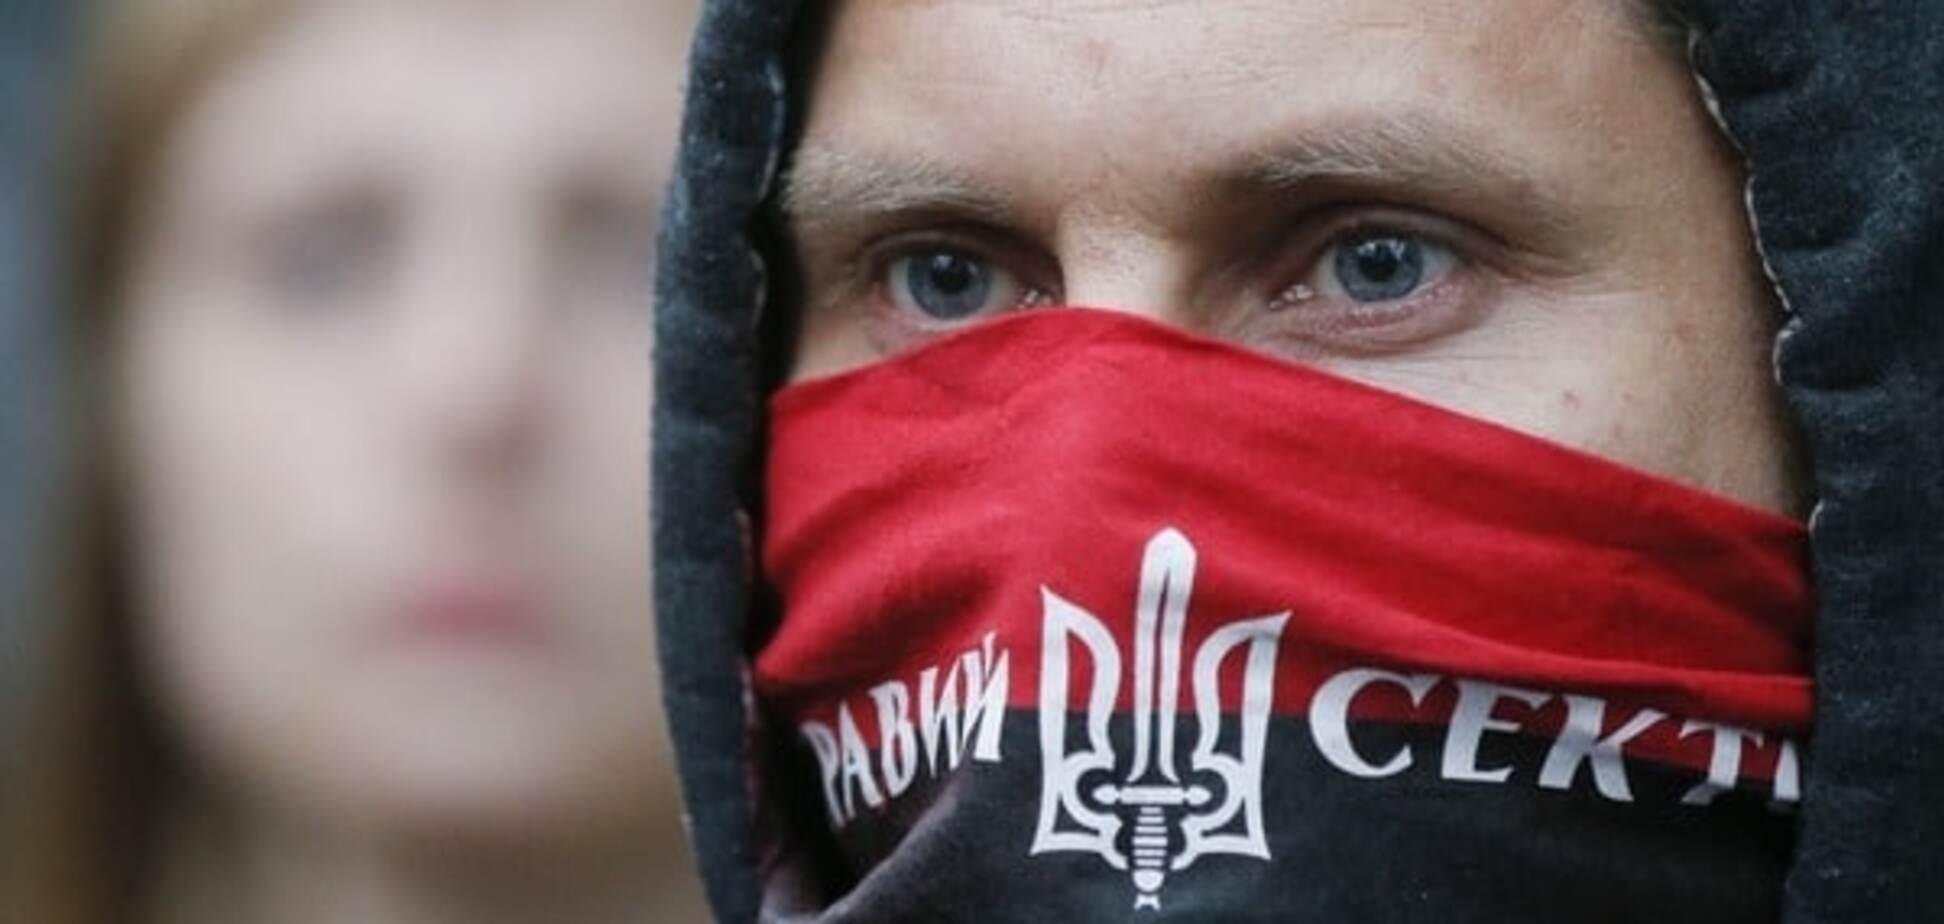 Терористи 'ДНР' поширили страшилку про 'Правий сектор'